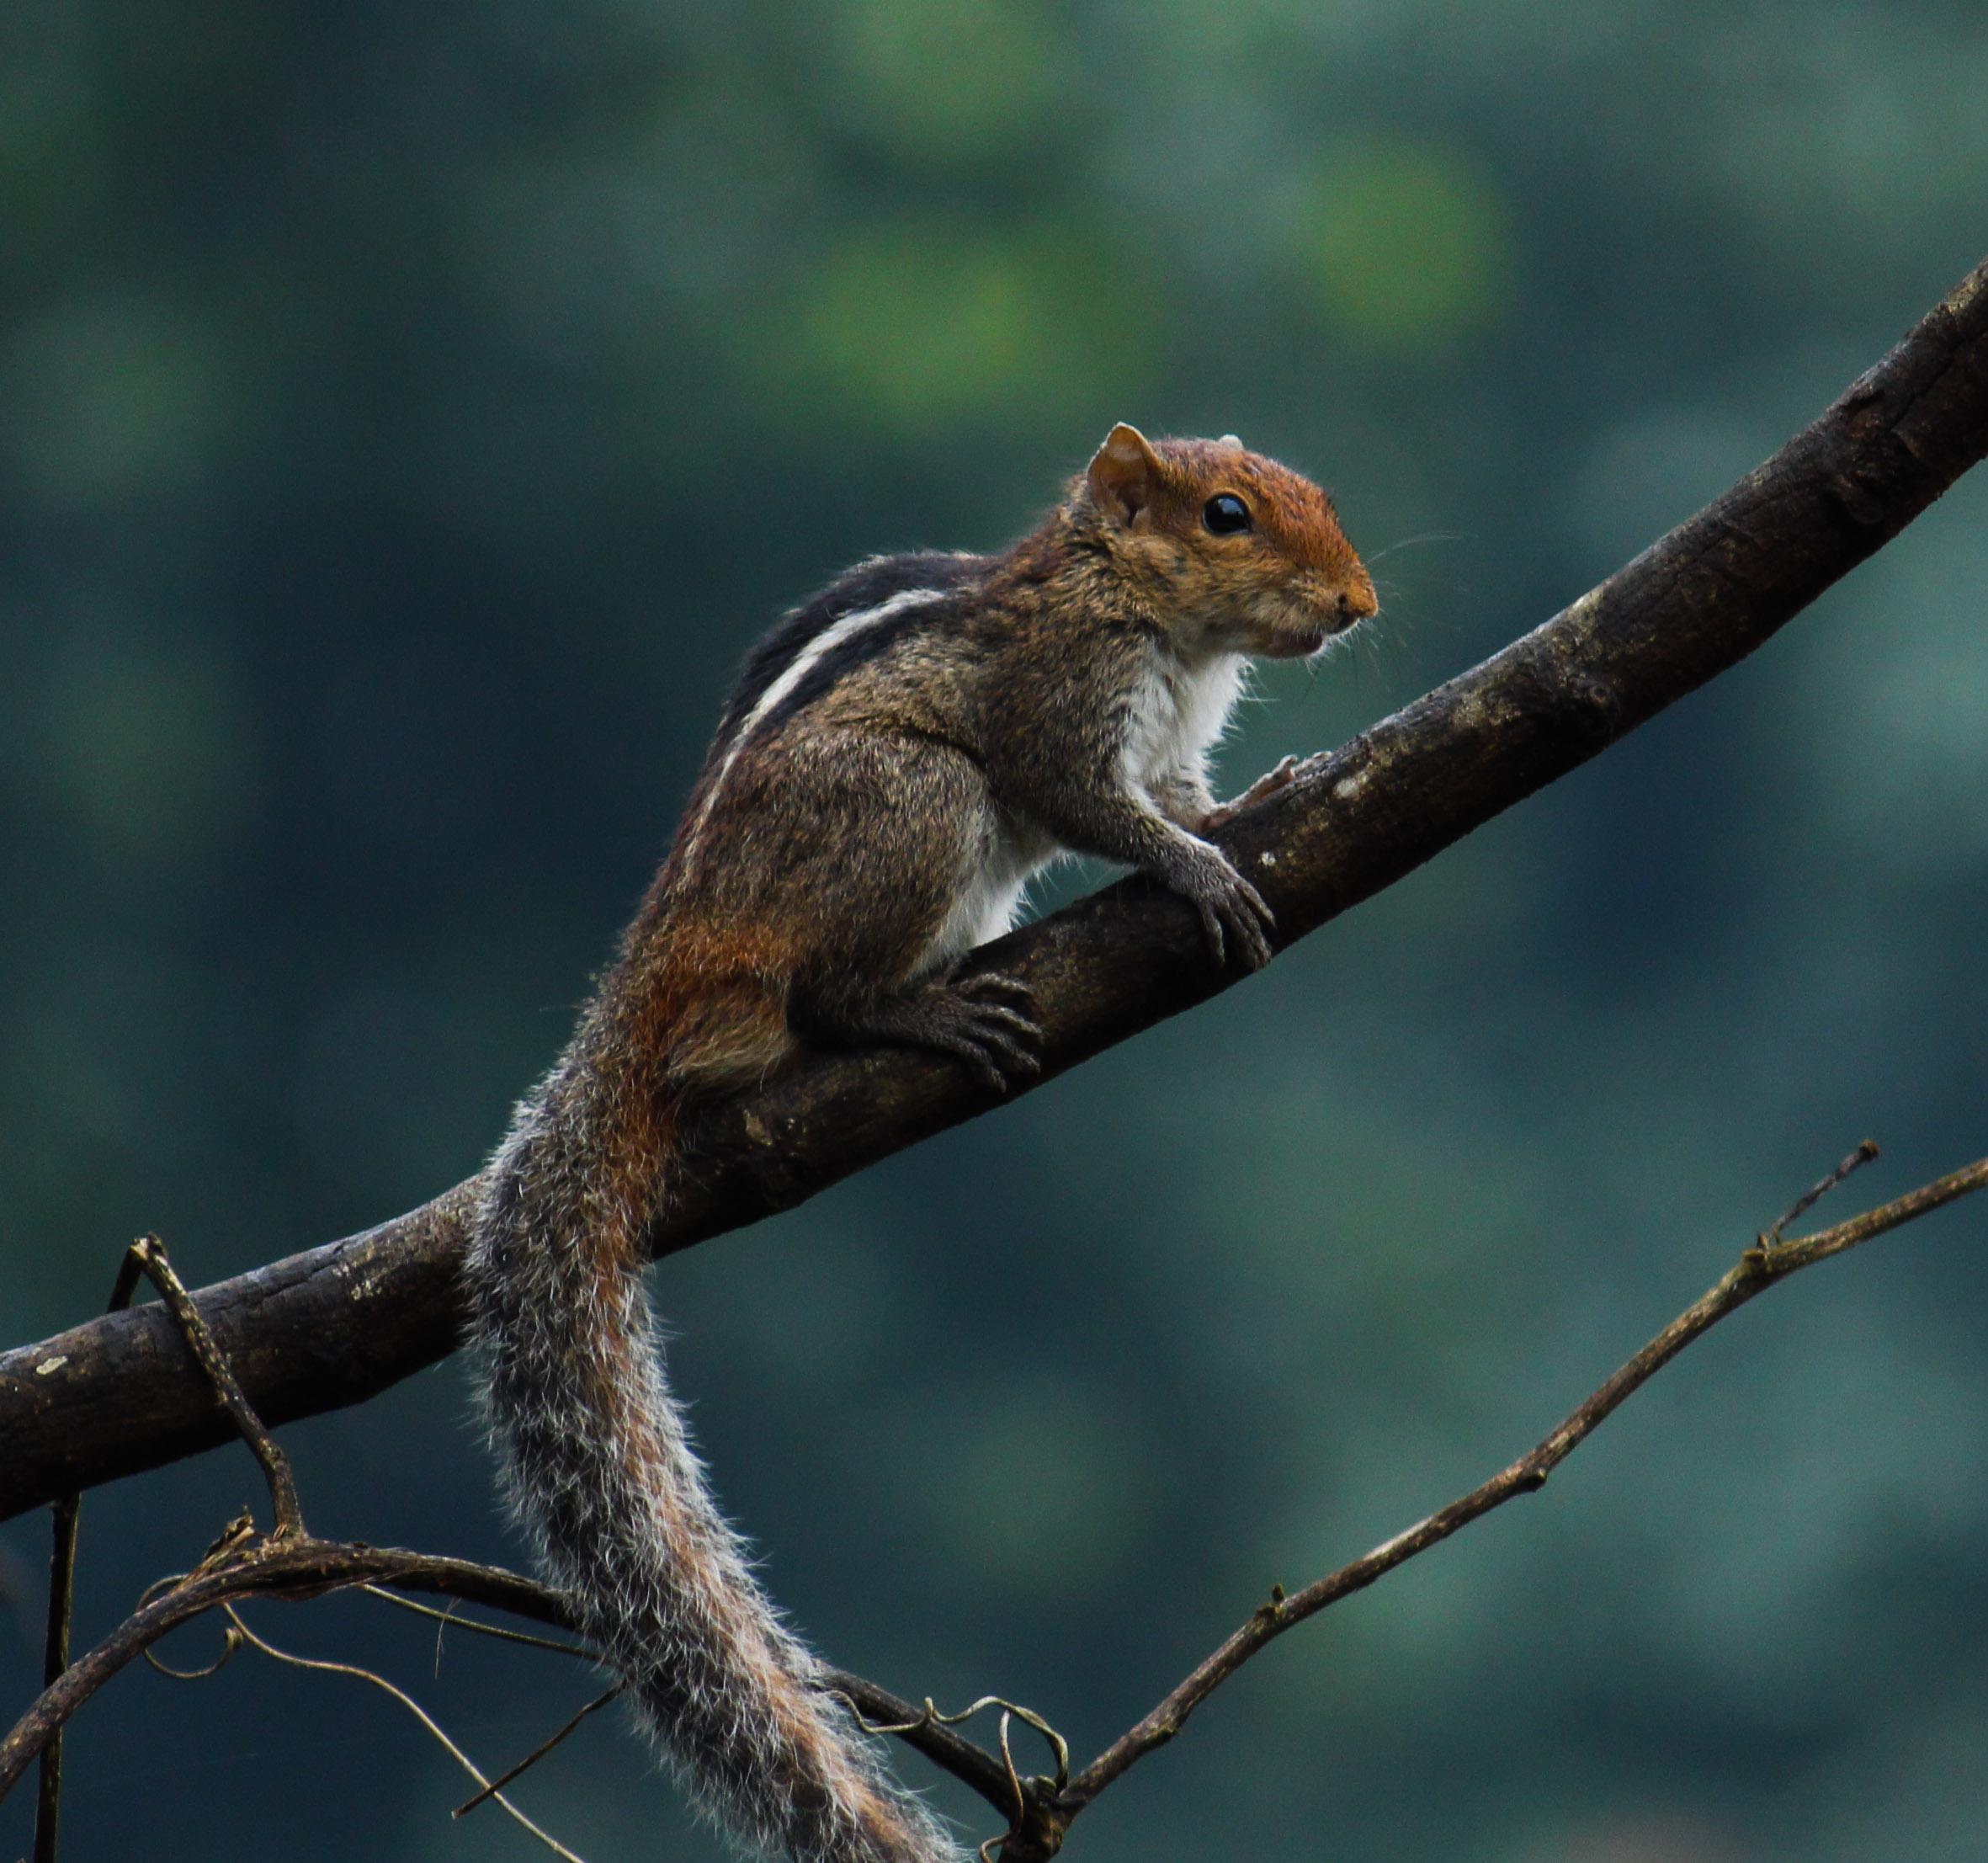 A squirrel on a plant